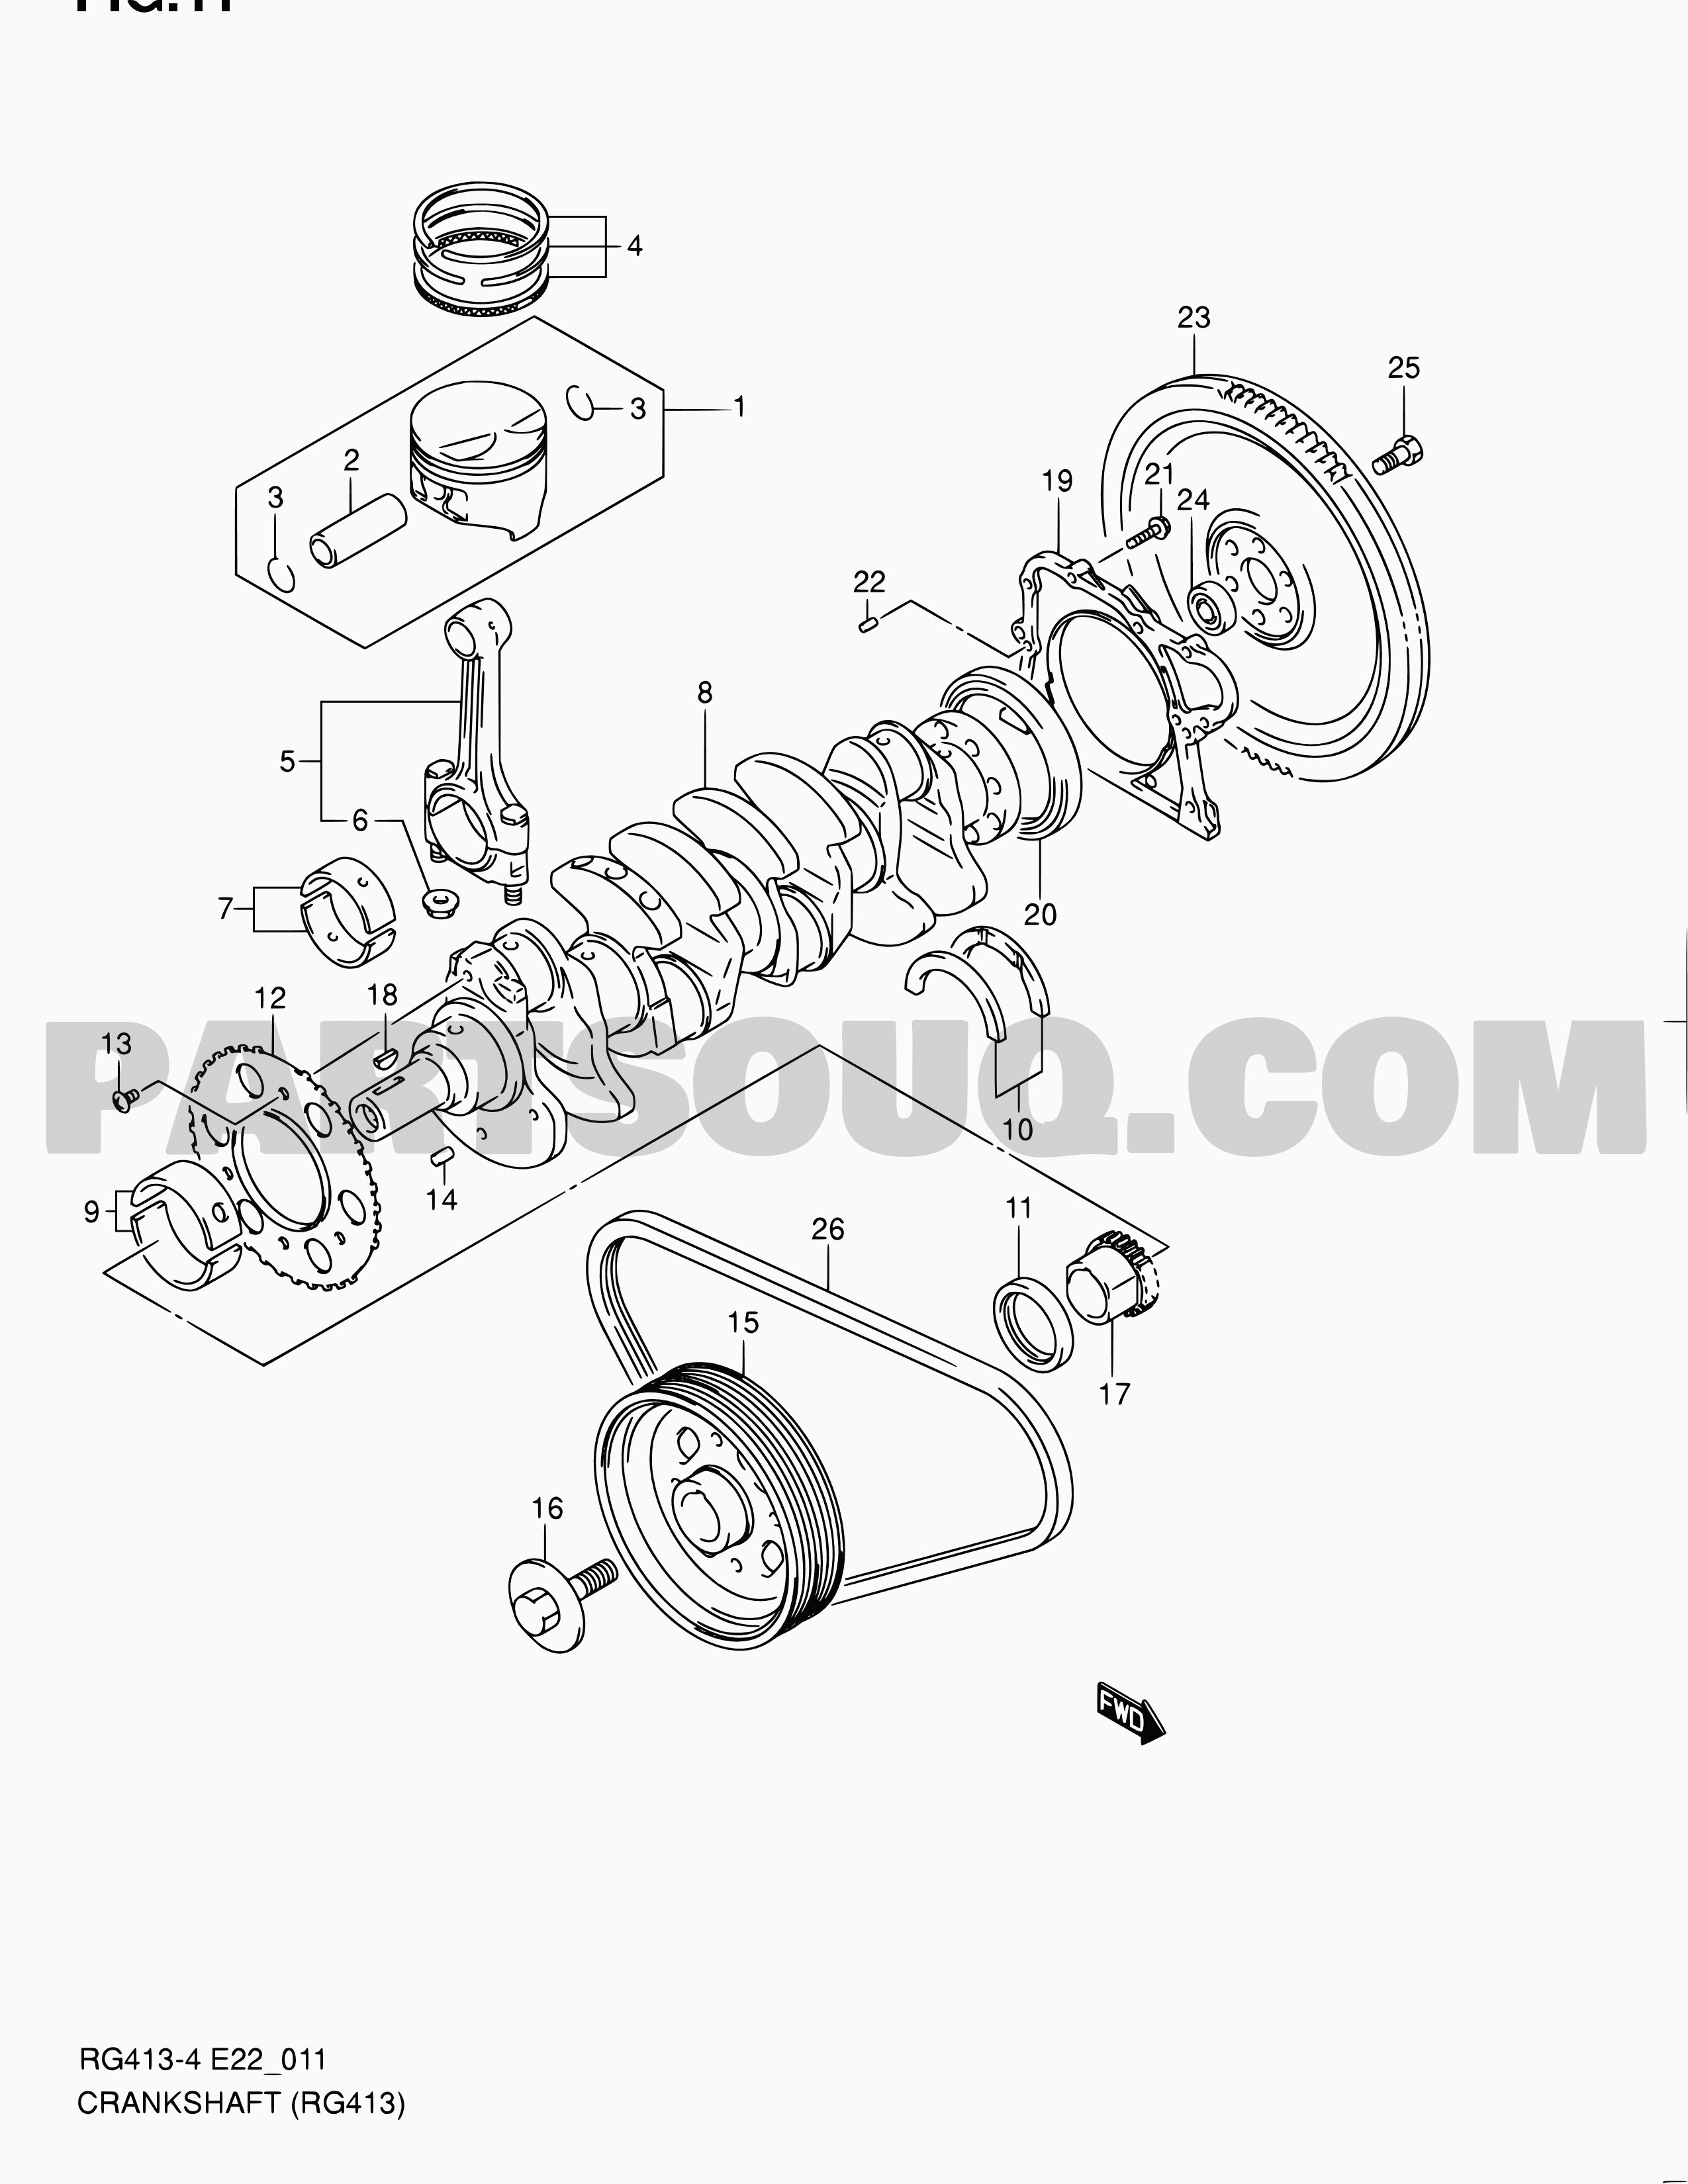 suzuki m13a engine diagram jimny z2t m13a jsafjb43v suzuki